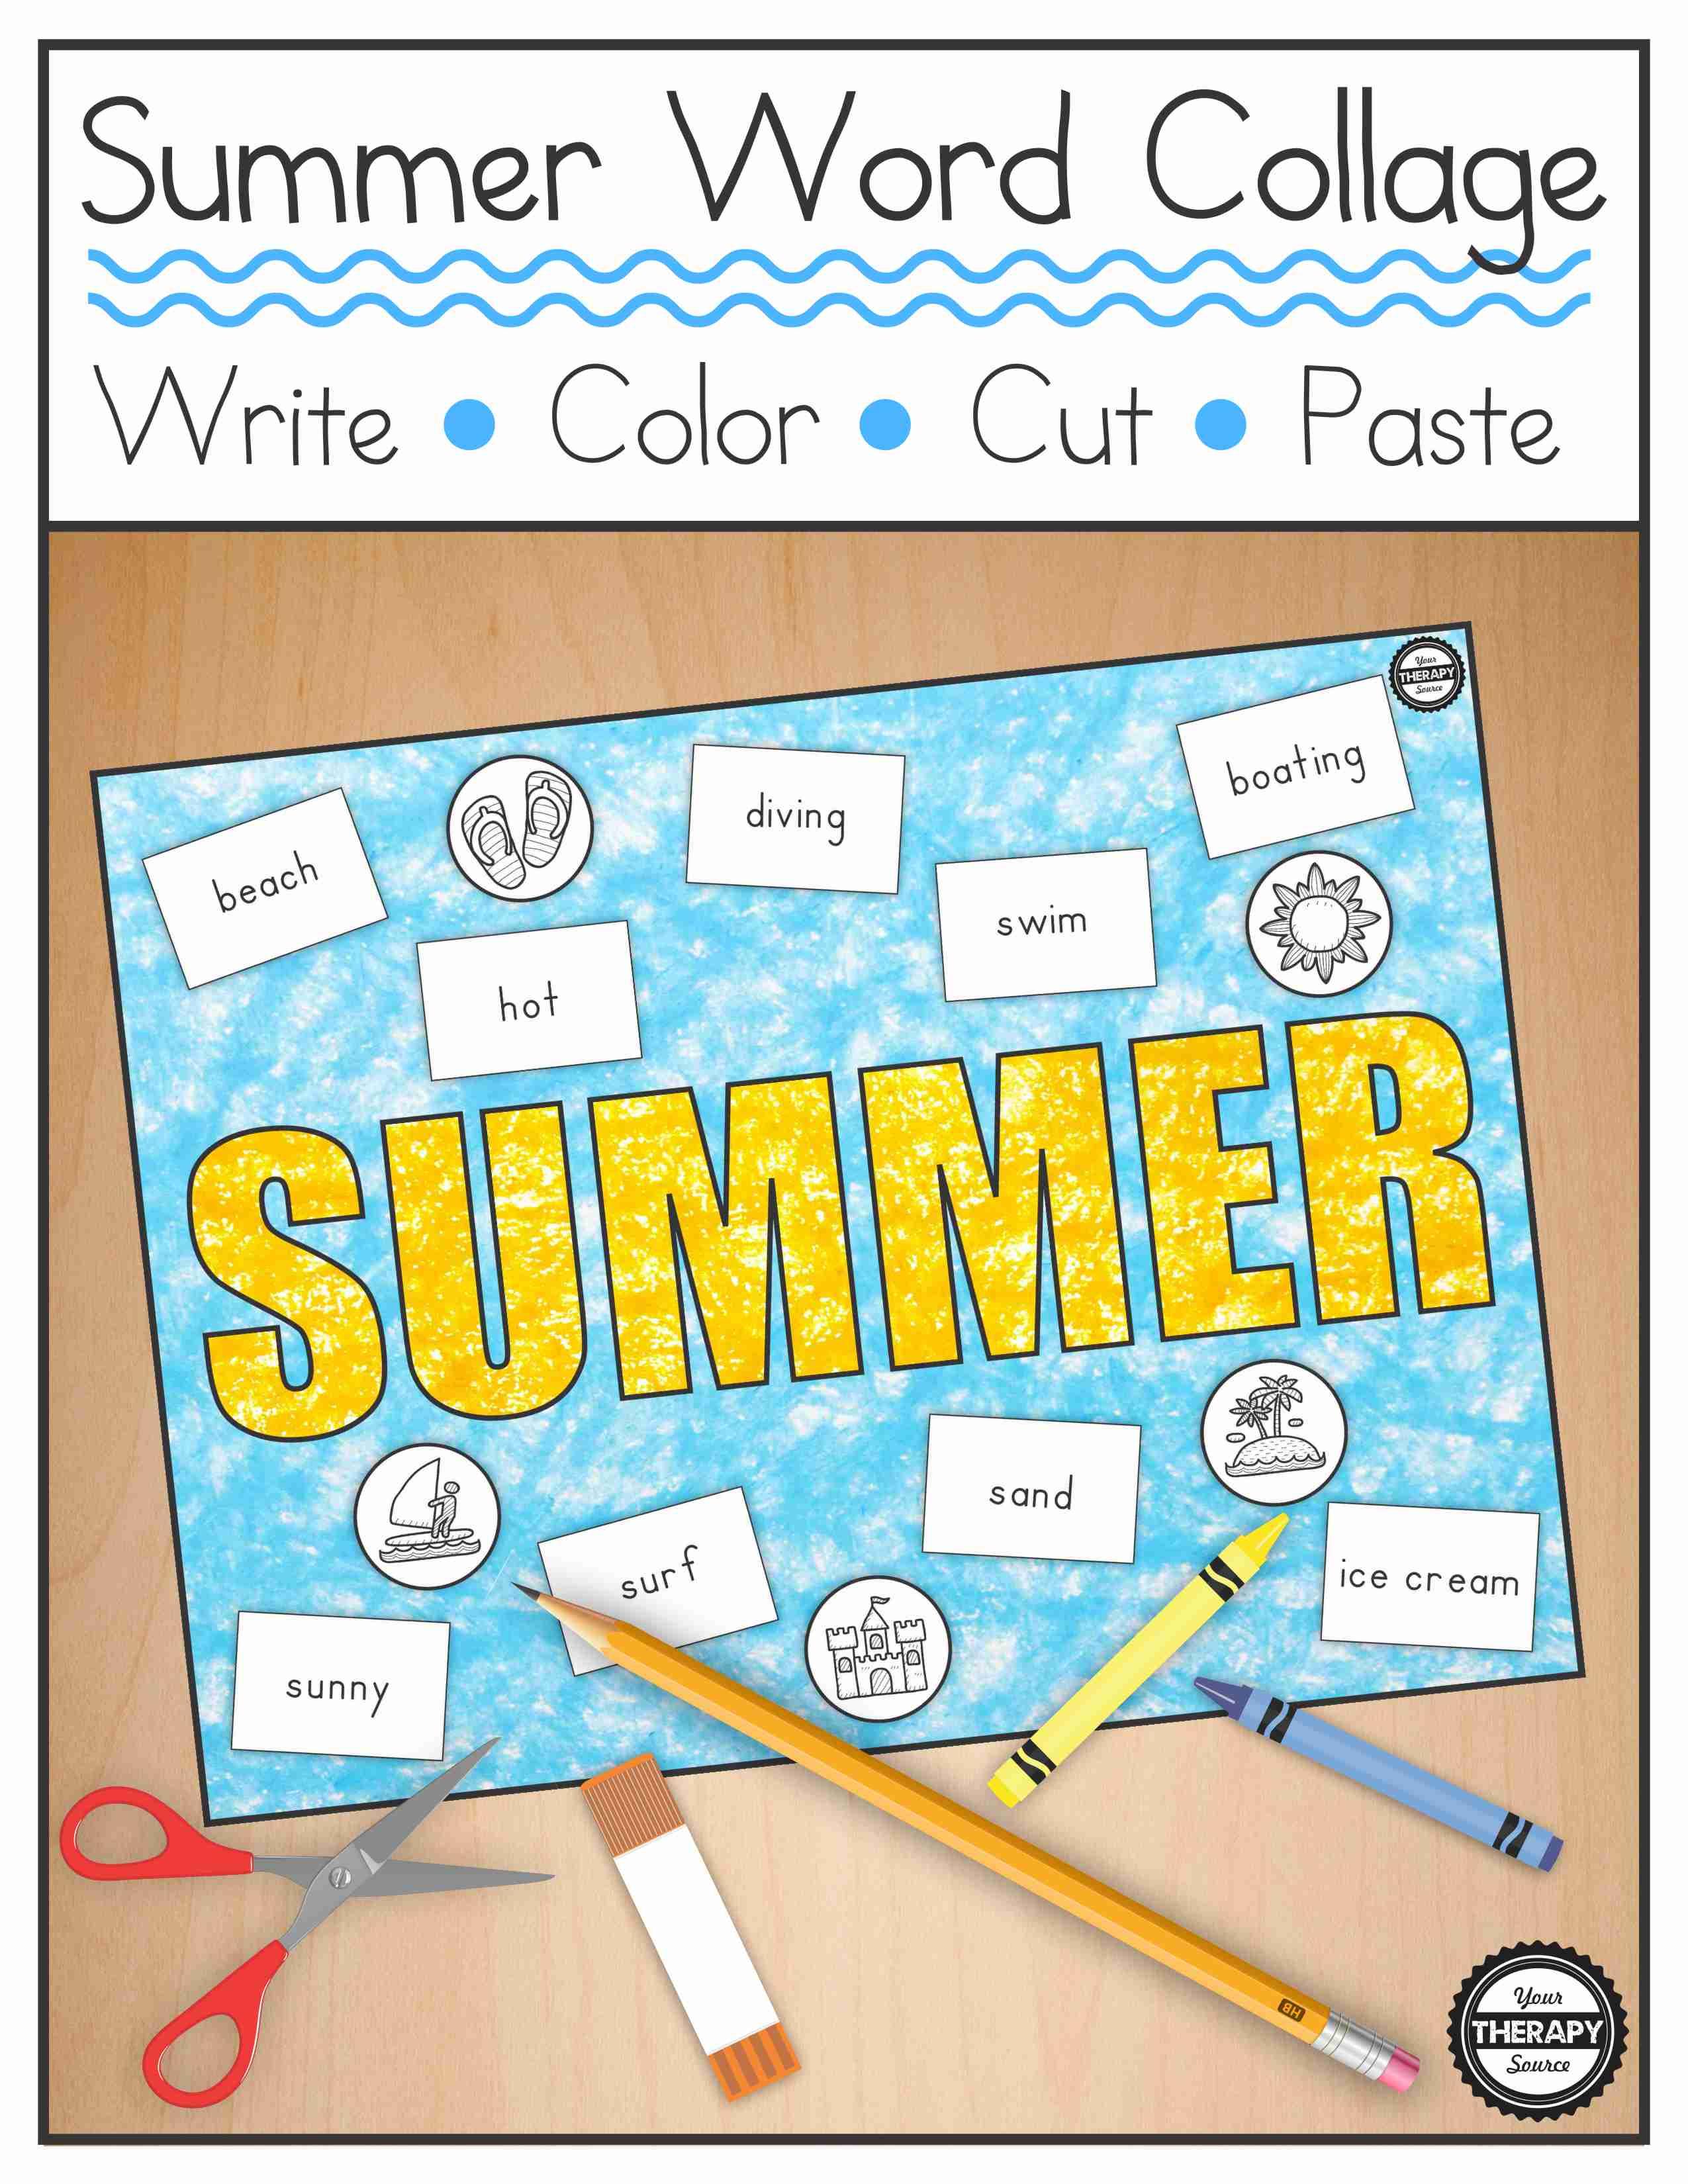 Summer Word Collage